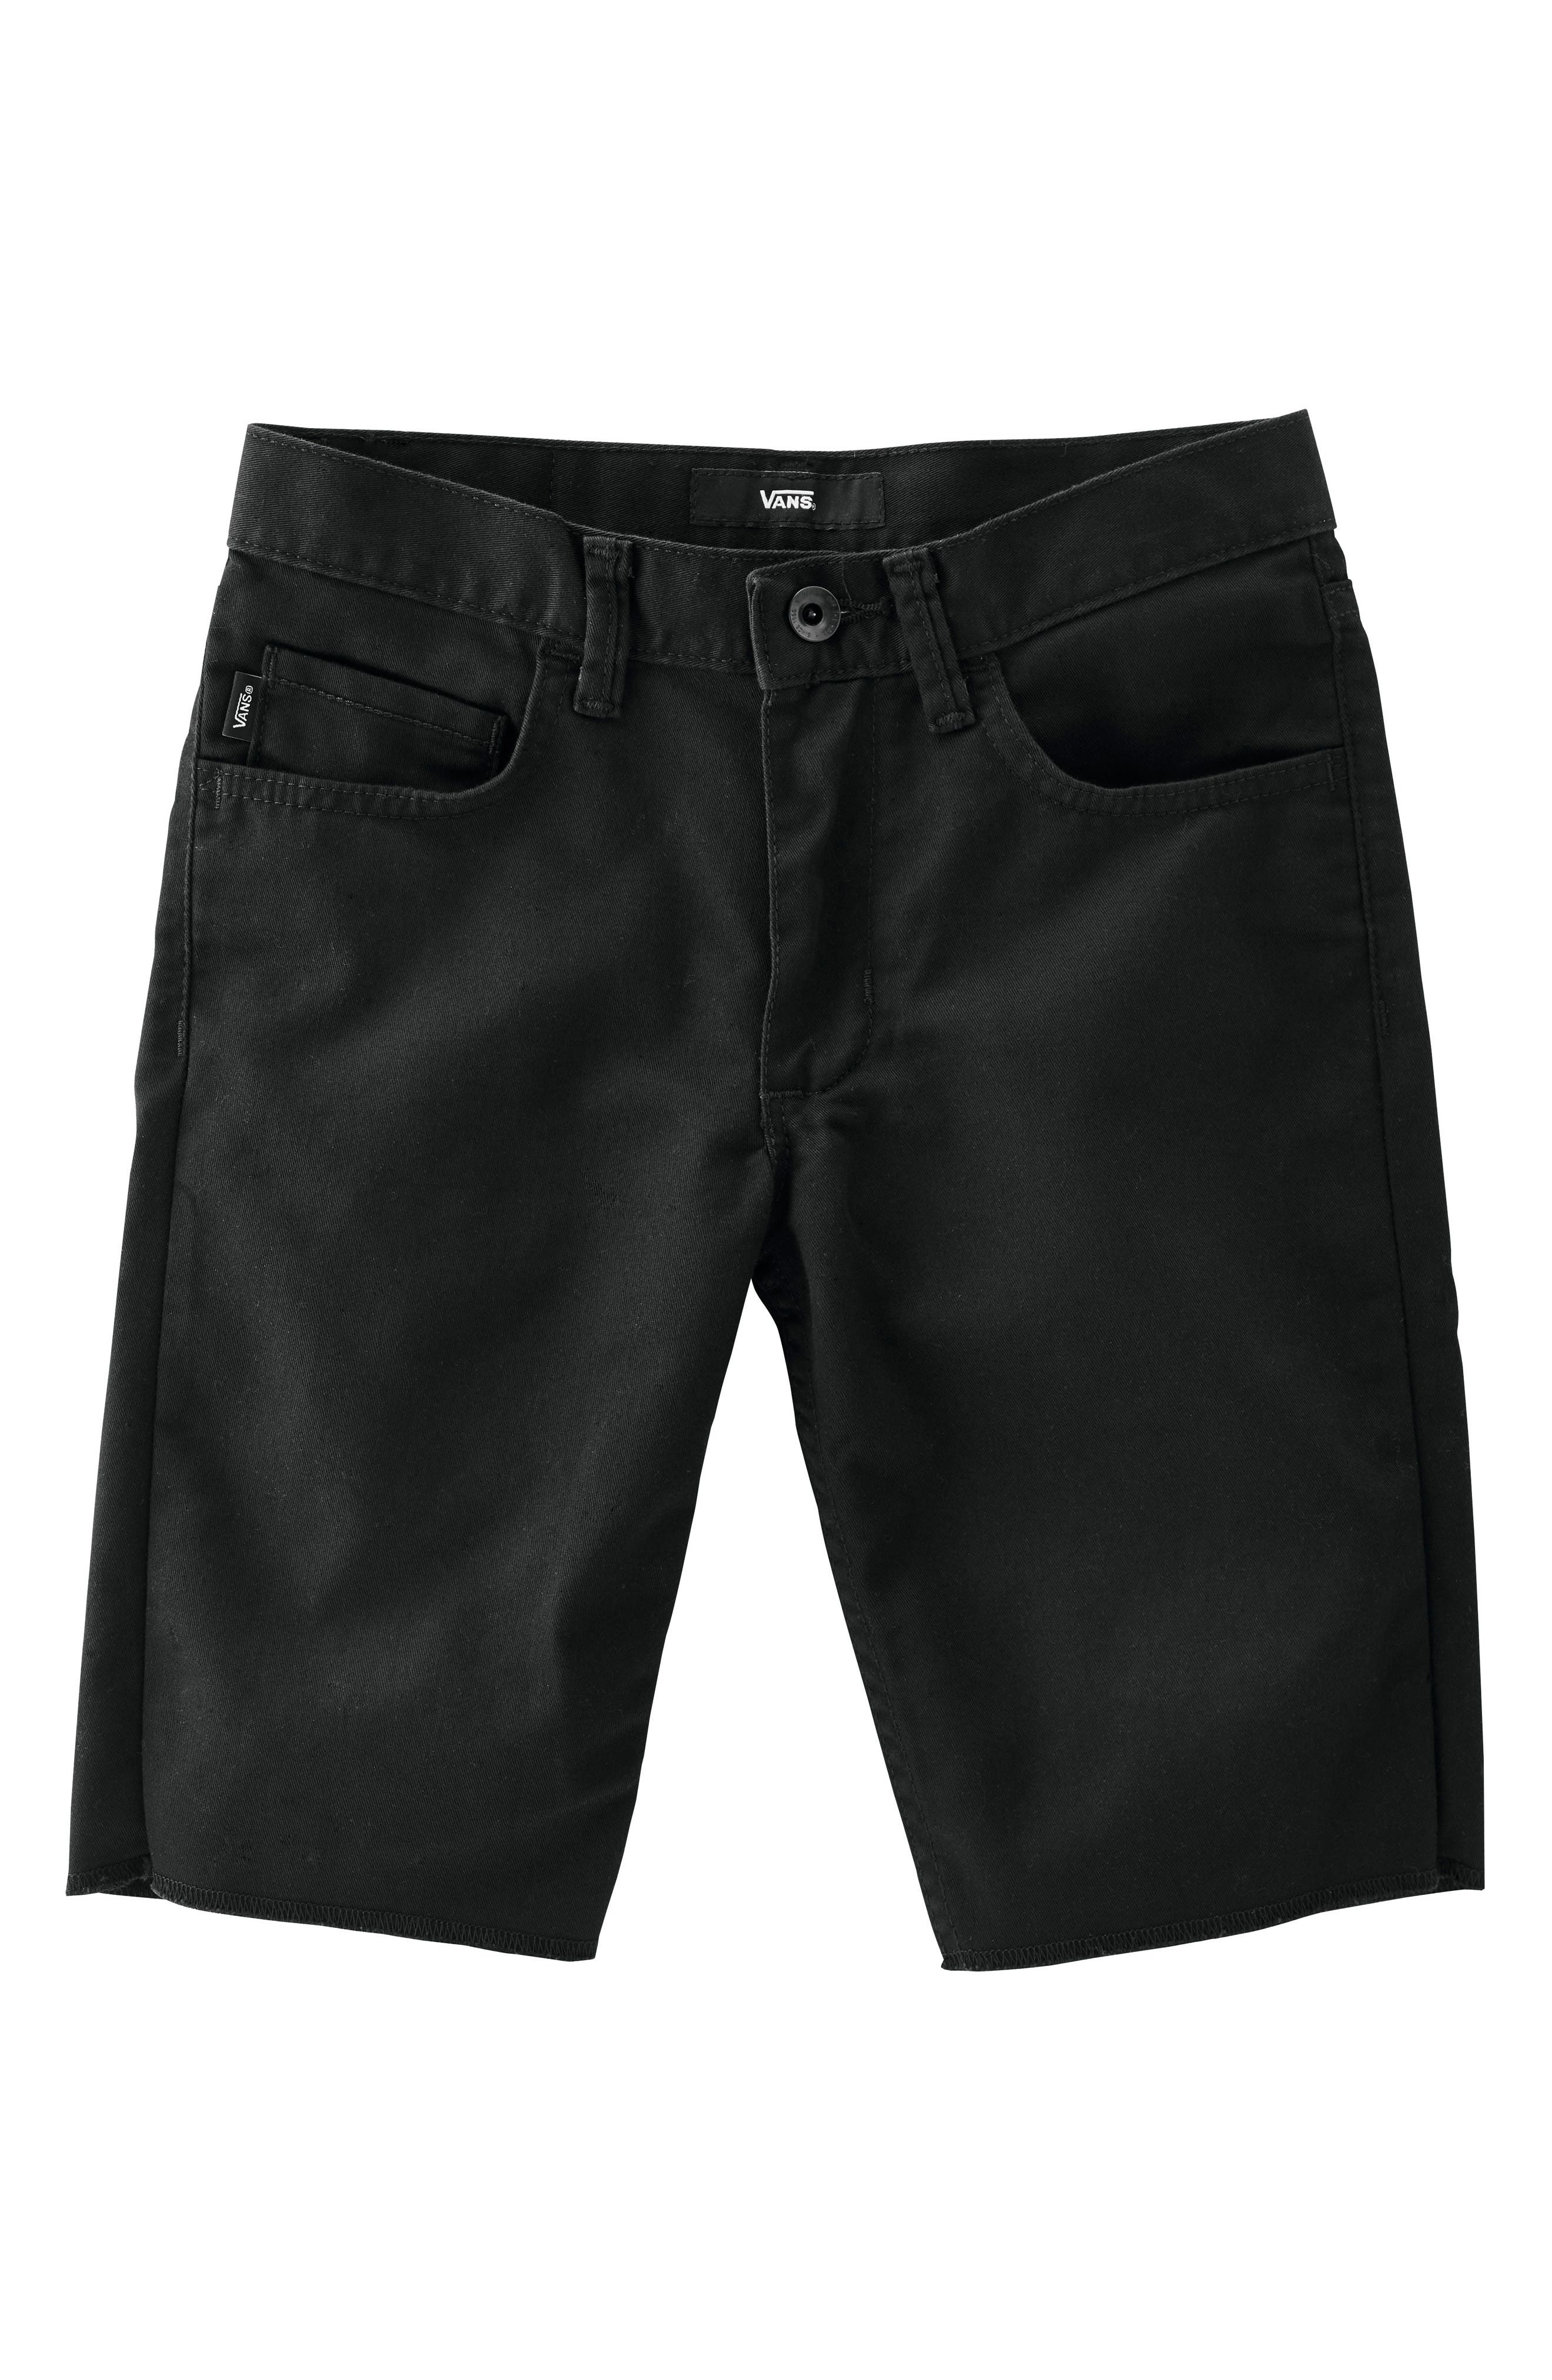 Covina II - Anthony Van Engelen Twill Shorts,                         Main,                         color, Black